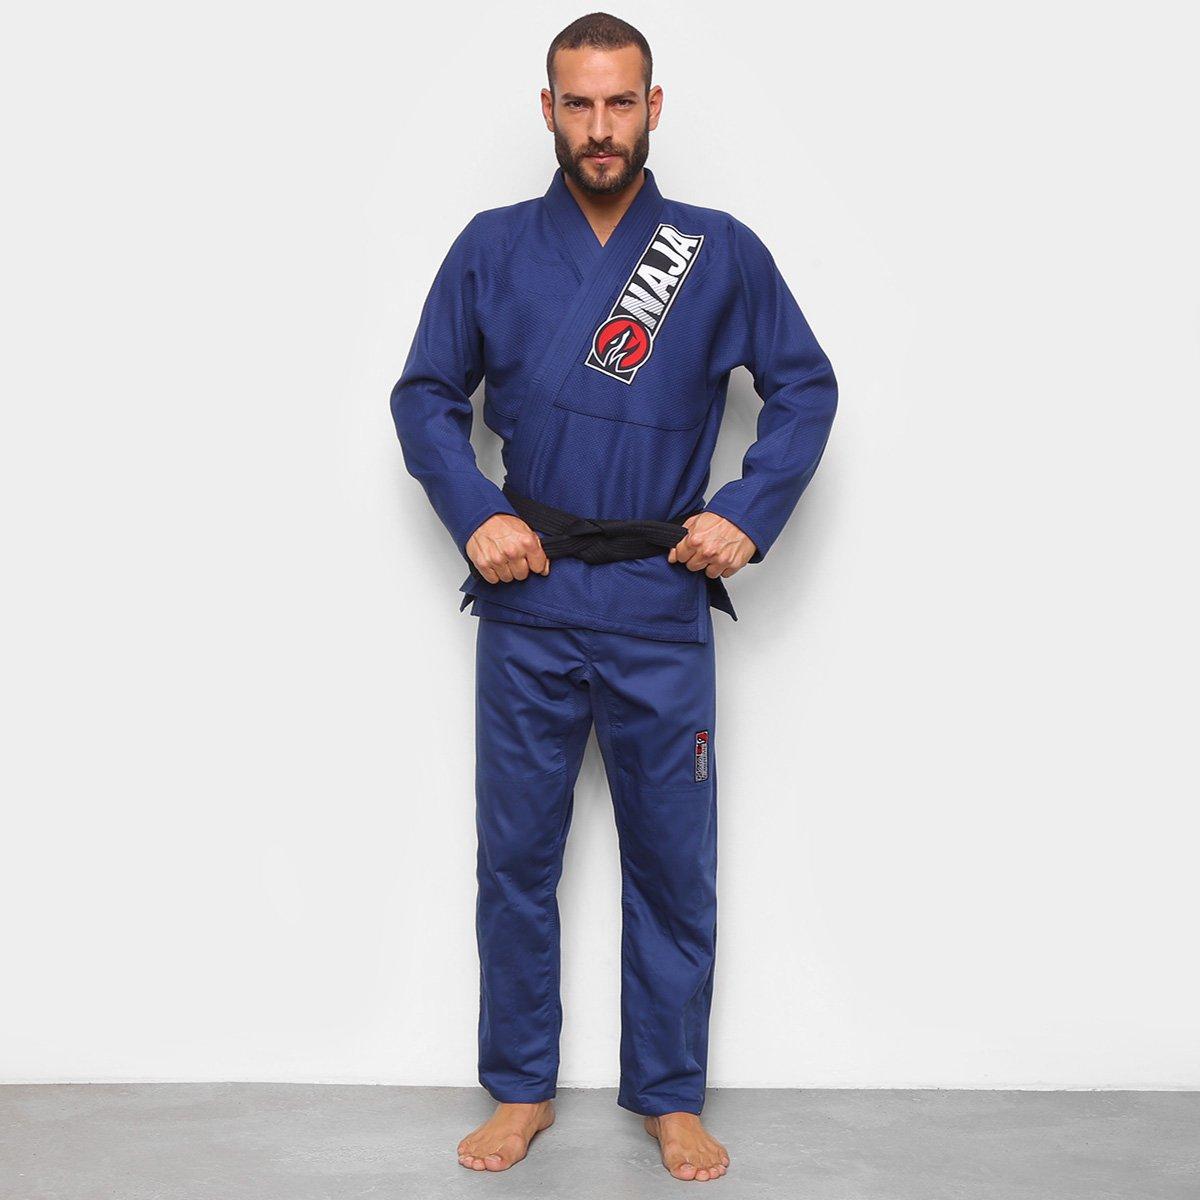 Kimono Naja Overcoming